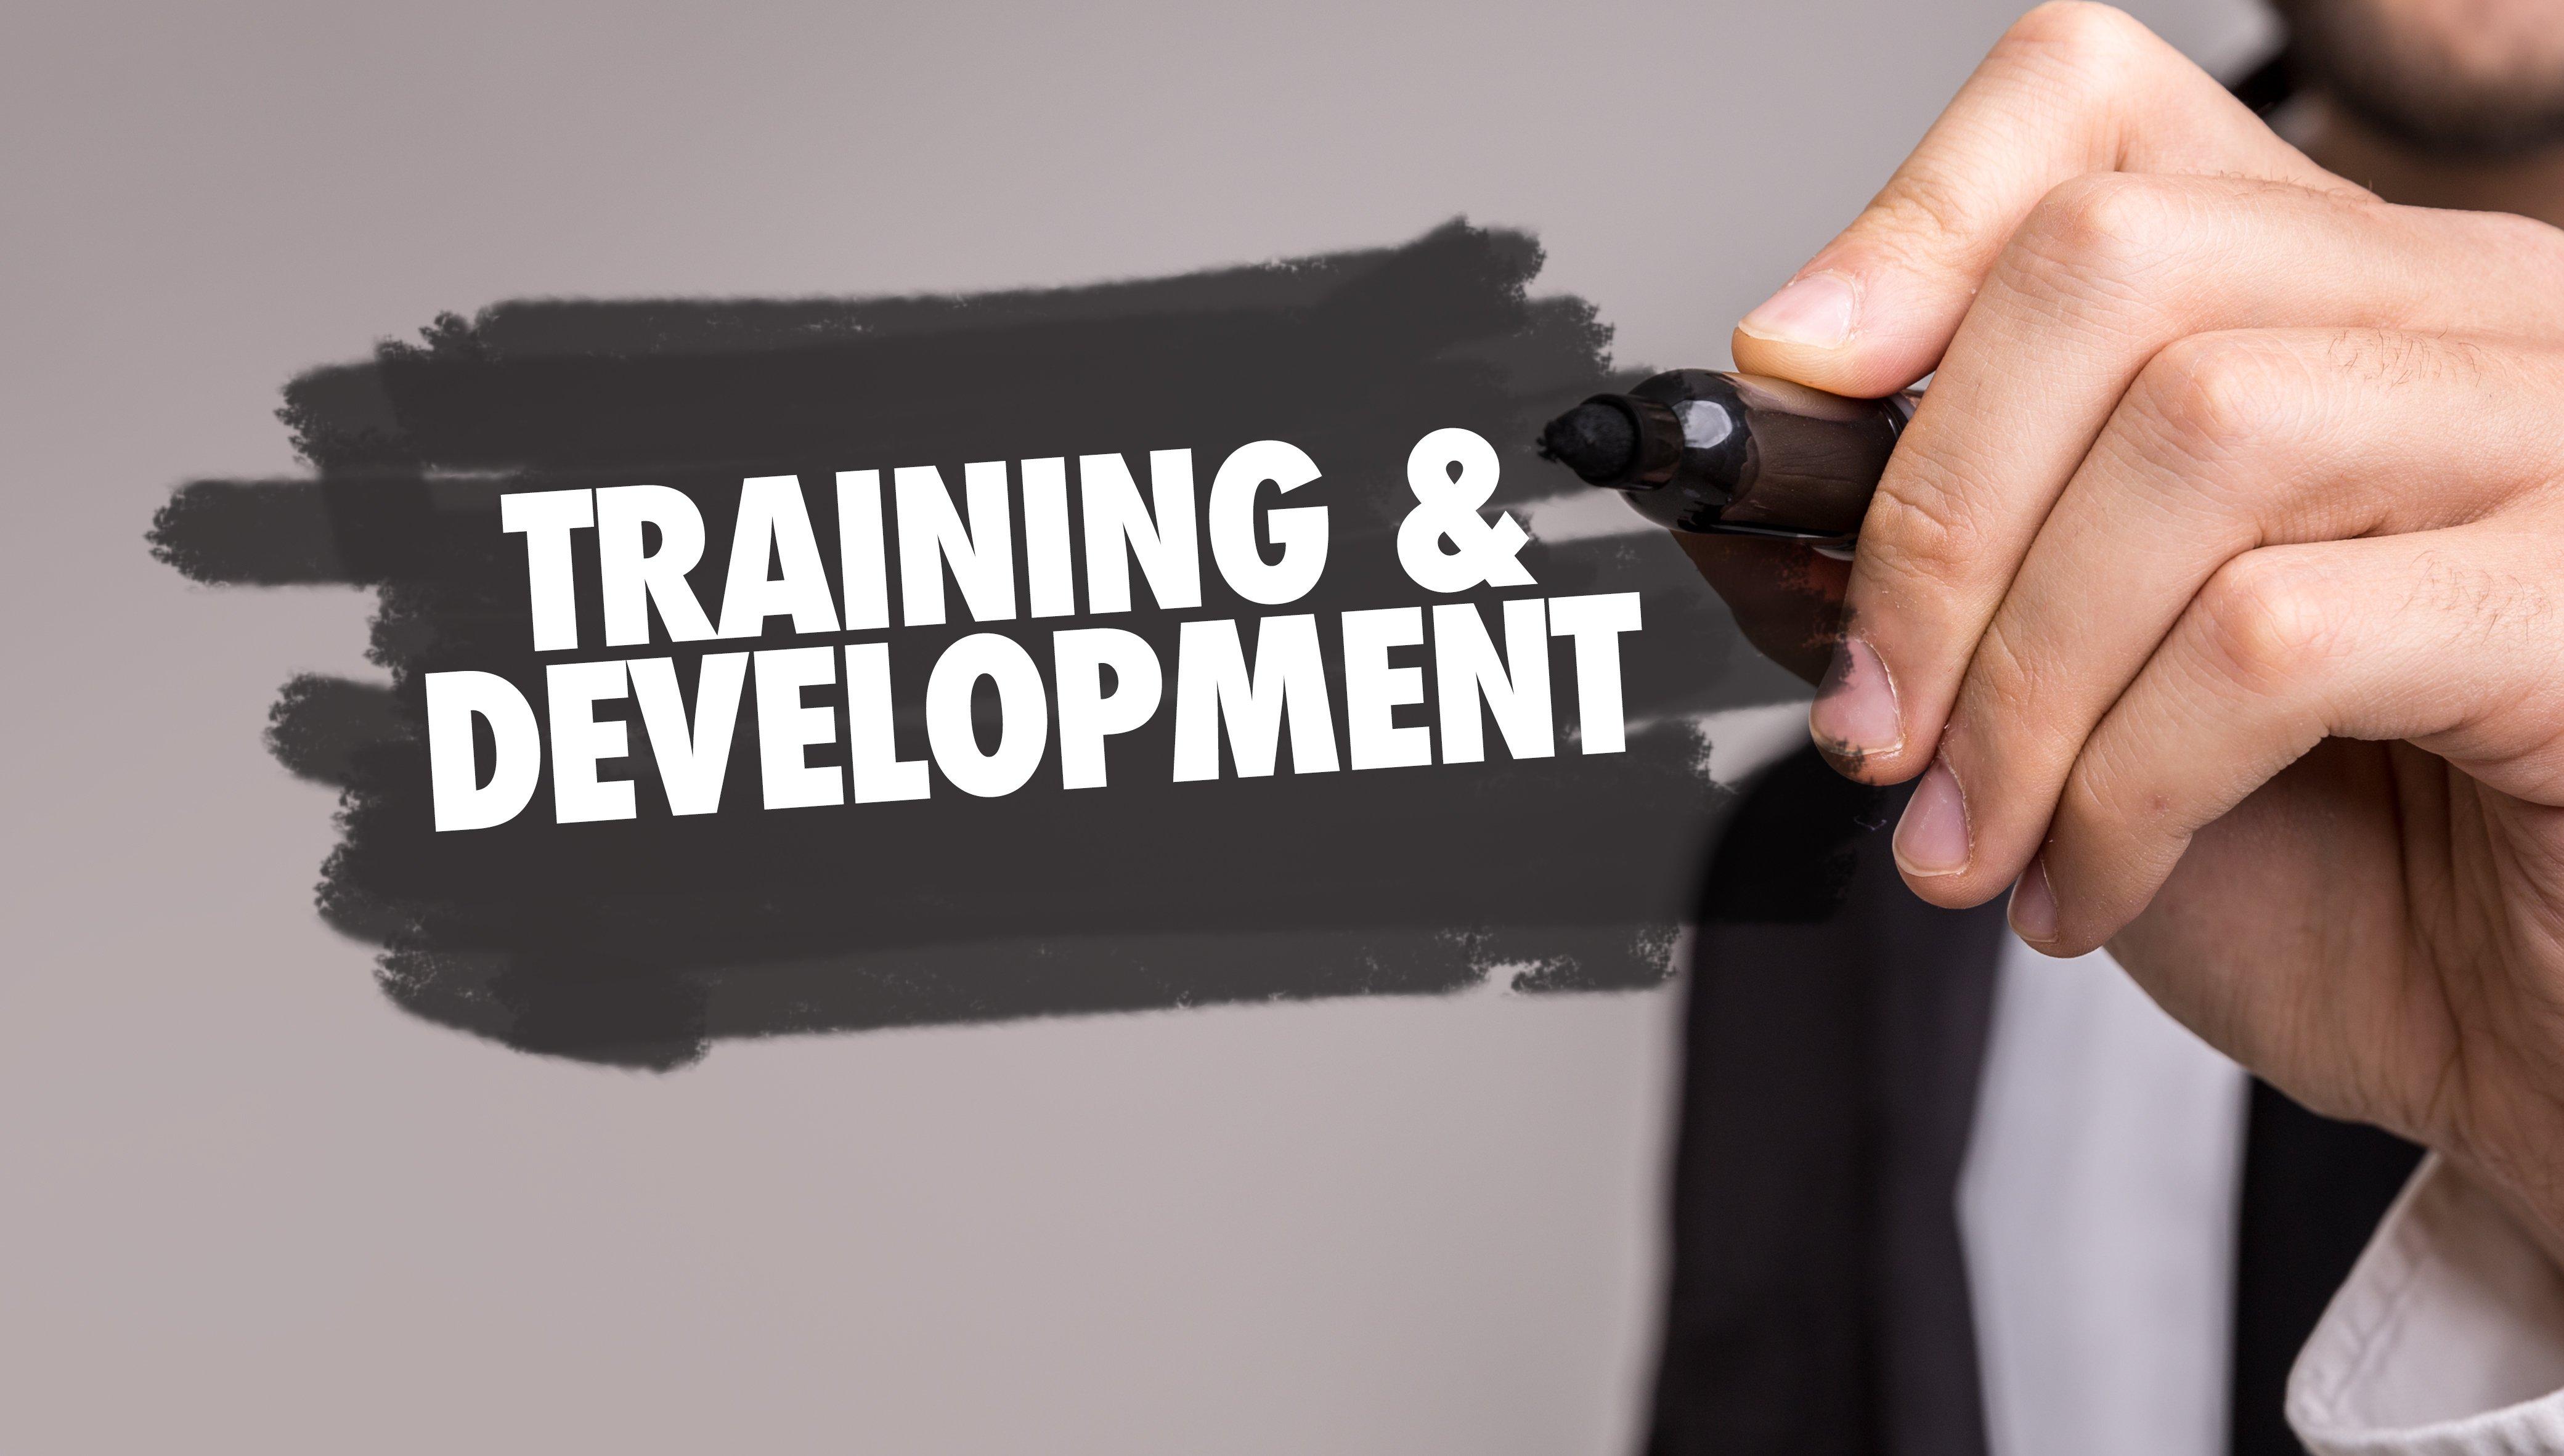 Training & Development sign